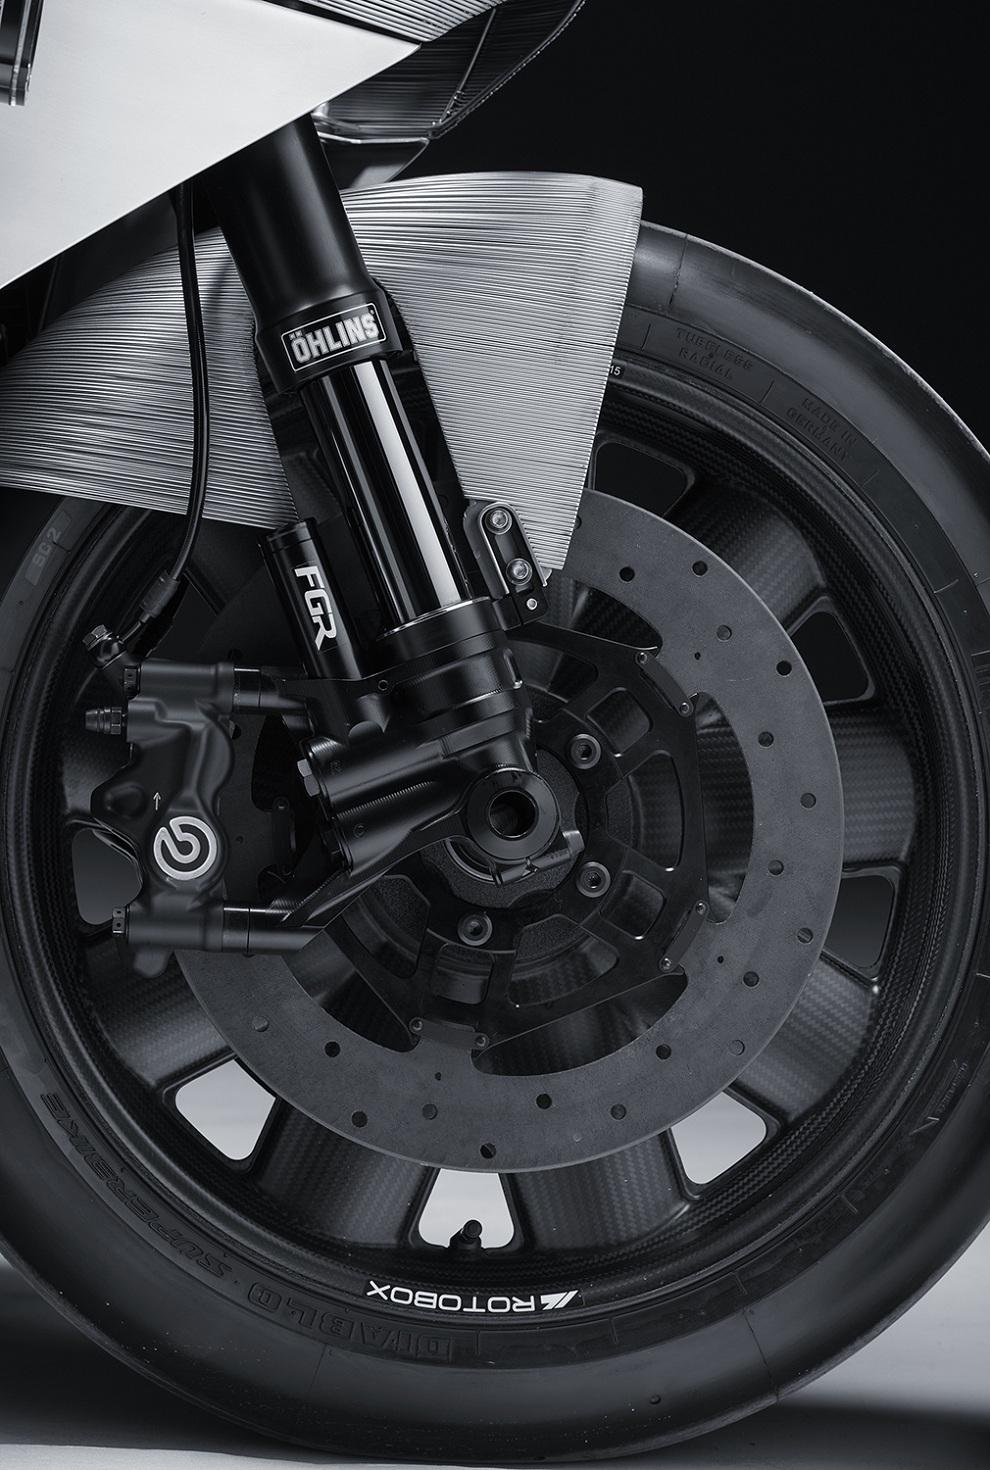 PRAEM Converts Honda RC-51 into Modern SP3 Motorcycle (9)